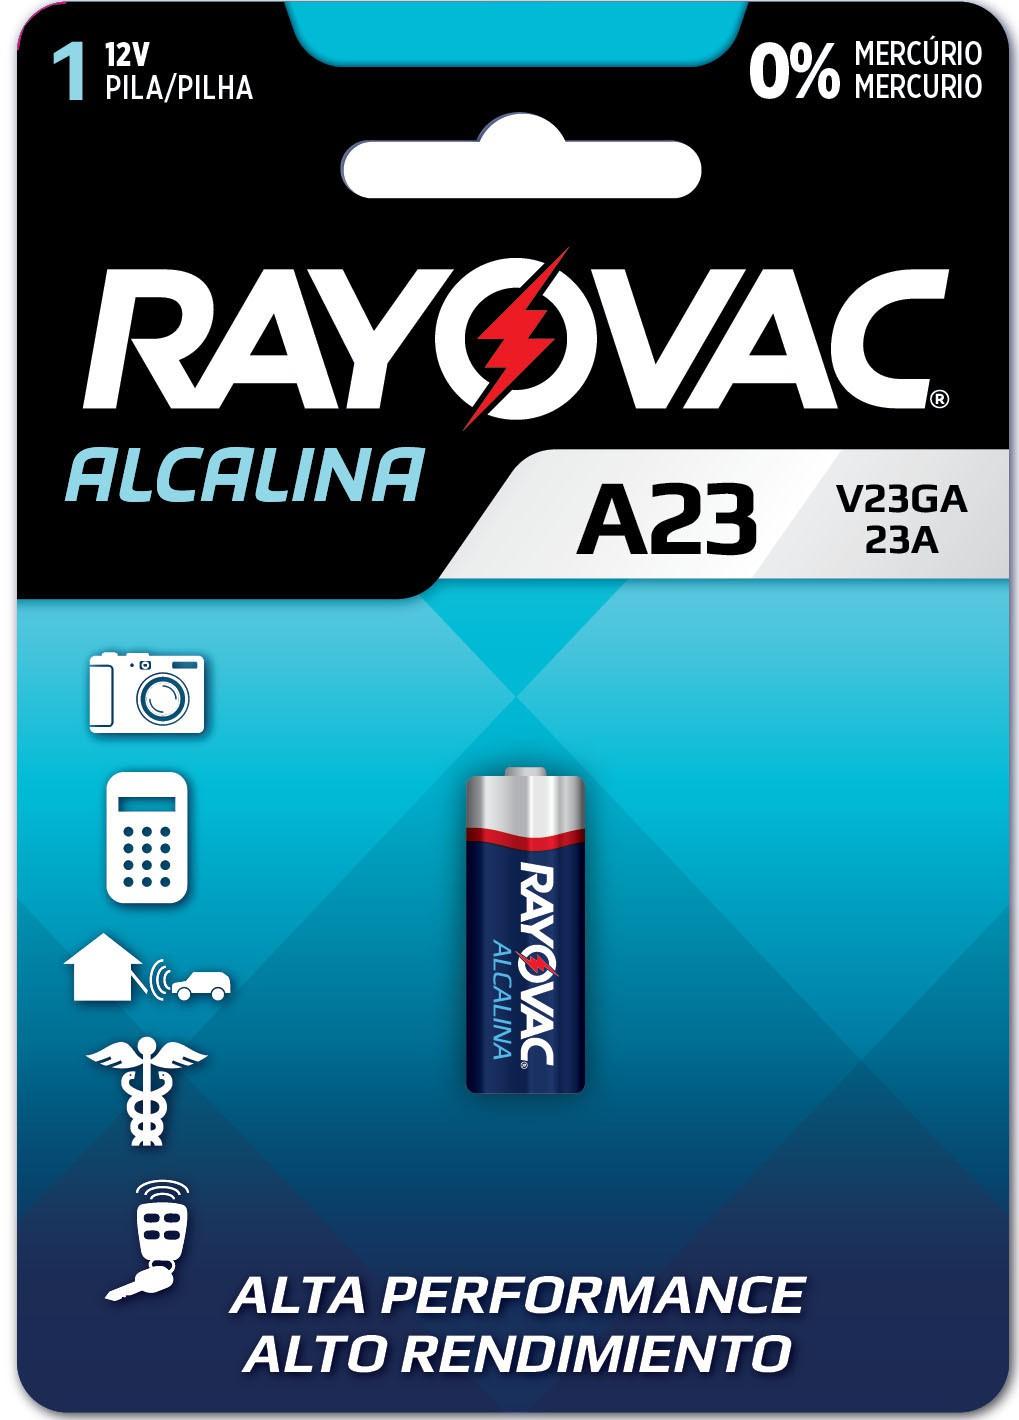 01 Pilha Bateria A23 23A 8LR932 12v Alcalina RAYOVAC - 01 cartela